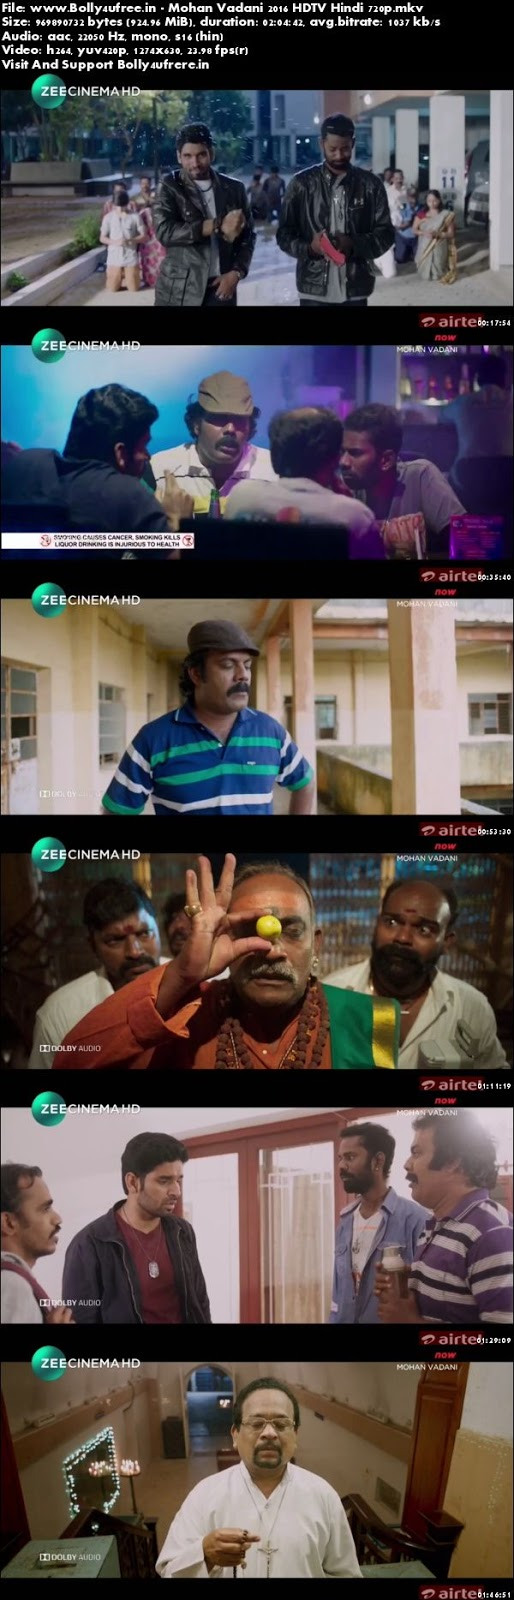 Mohan Vadani 2016 Hindi Dubbed 1GB HDTV 720p